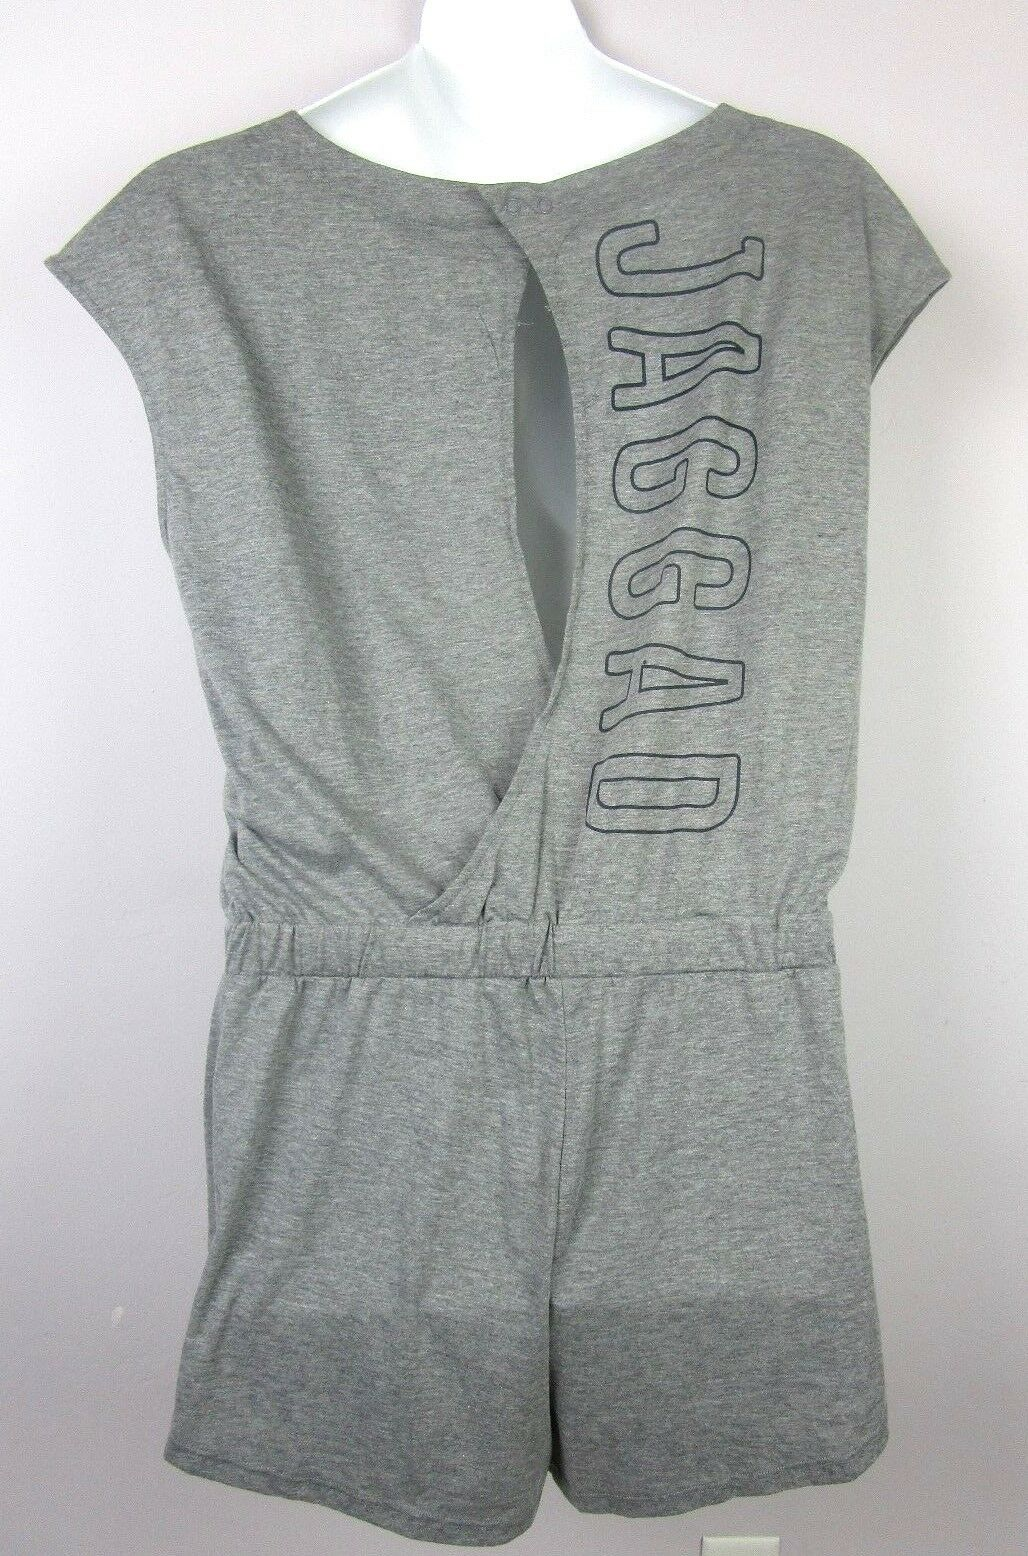 Jaggad Womens Shorts Romper Jumper Grey Marle Bento Playsuit Athletic Cycling XL